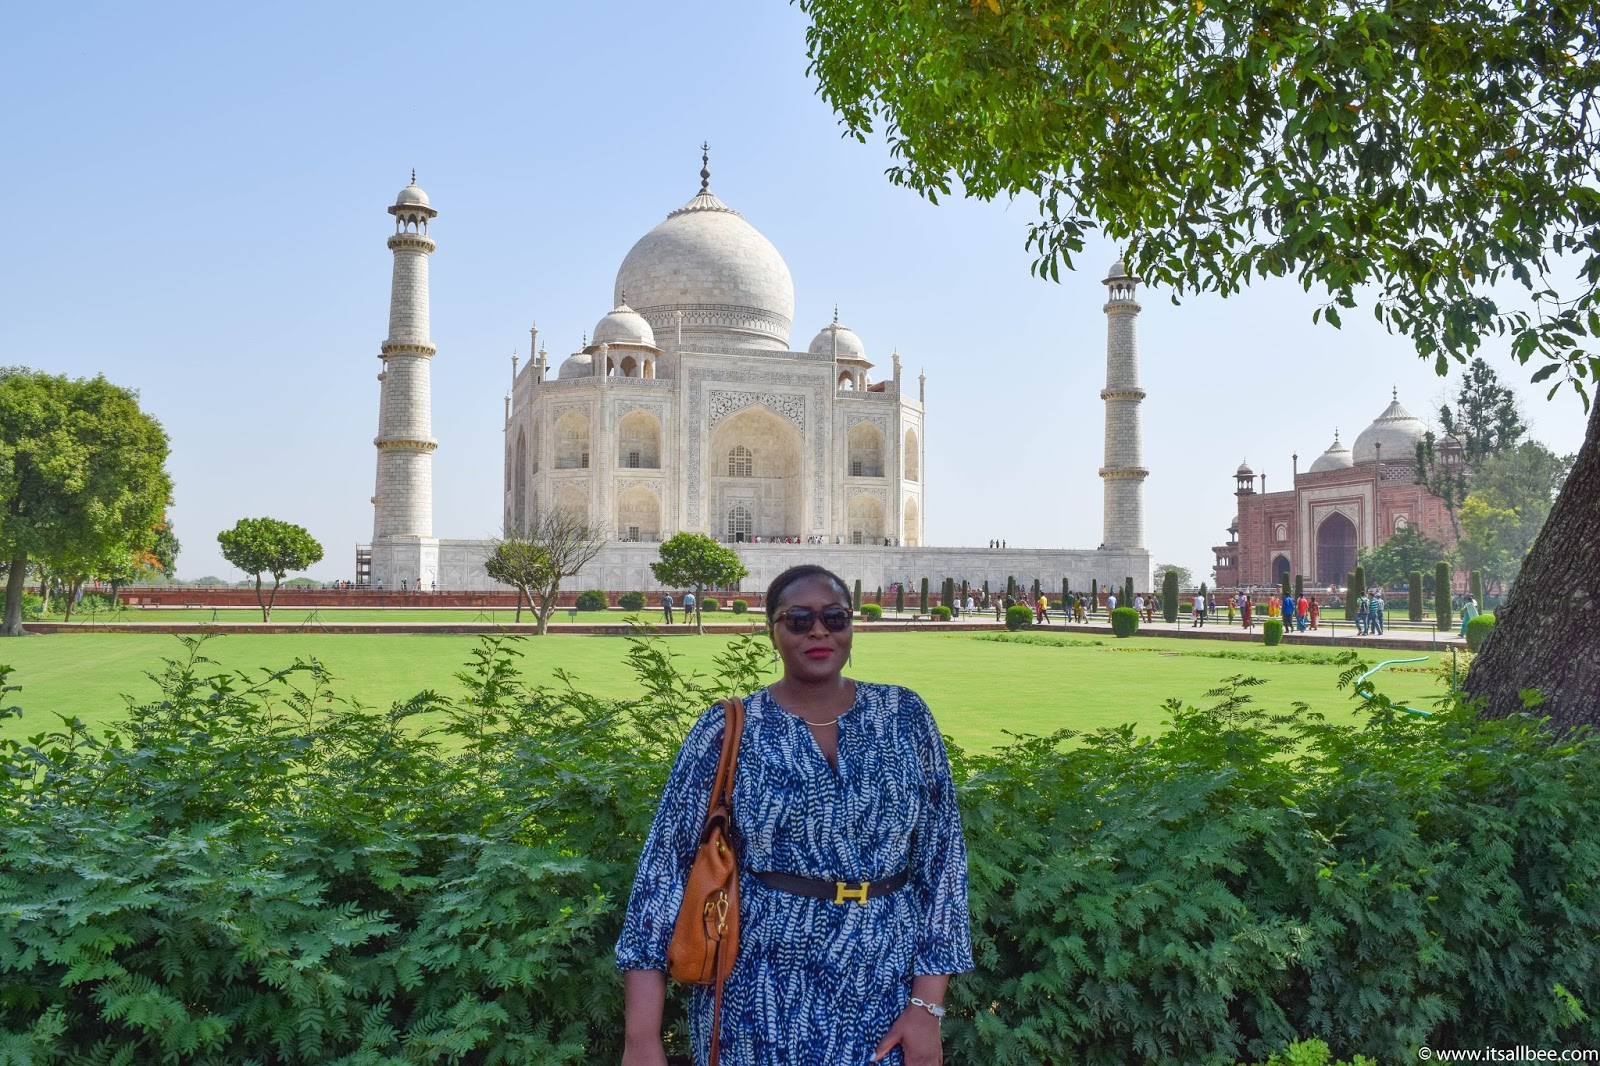 Taj Mahal In Photos | An Indian Love Story